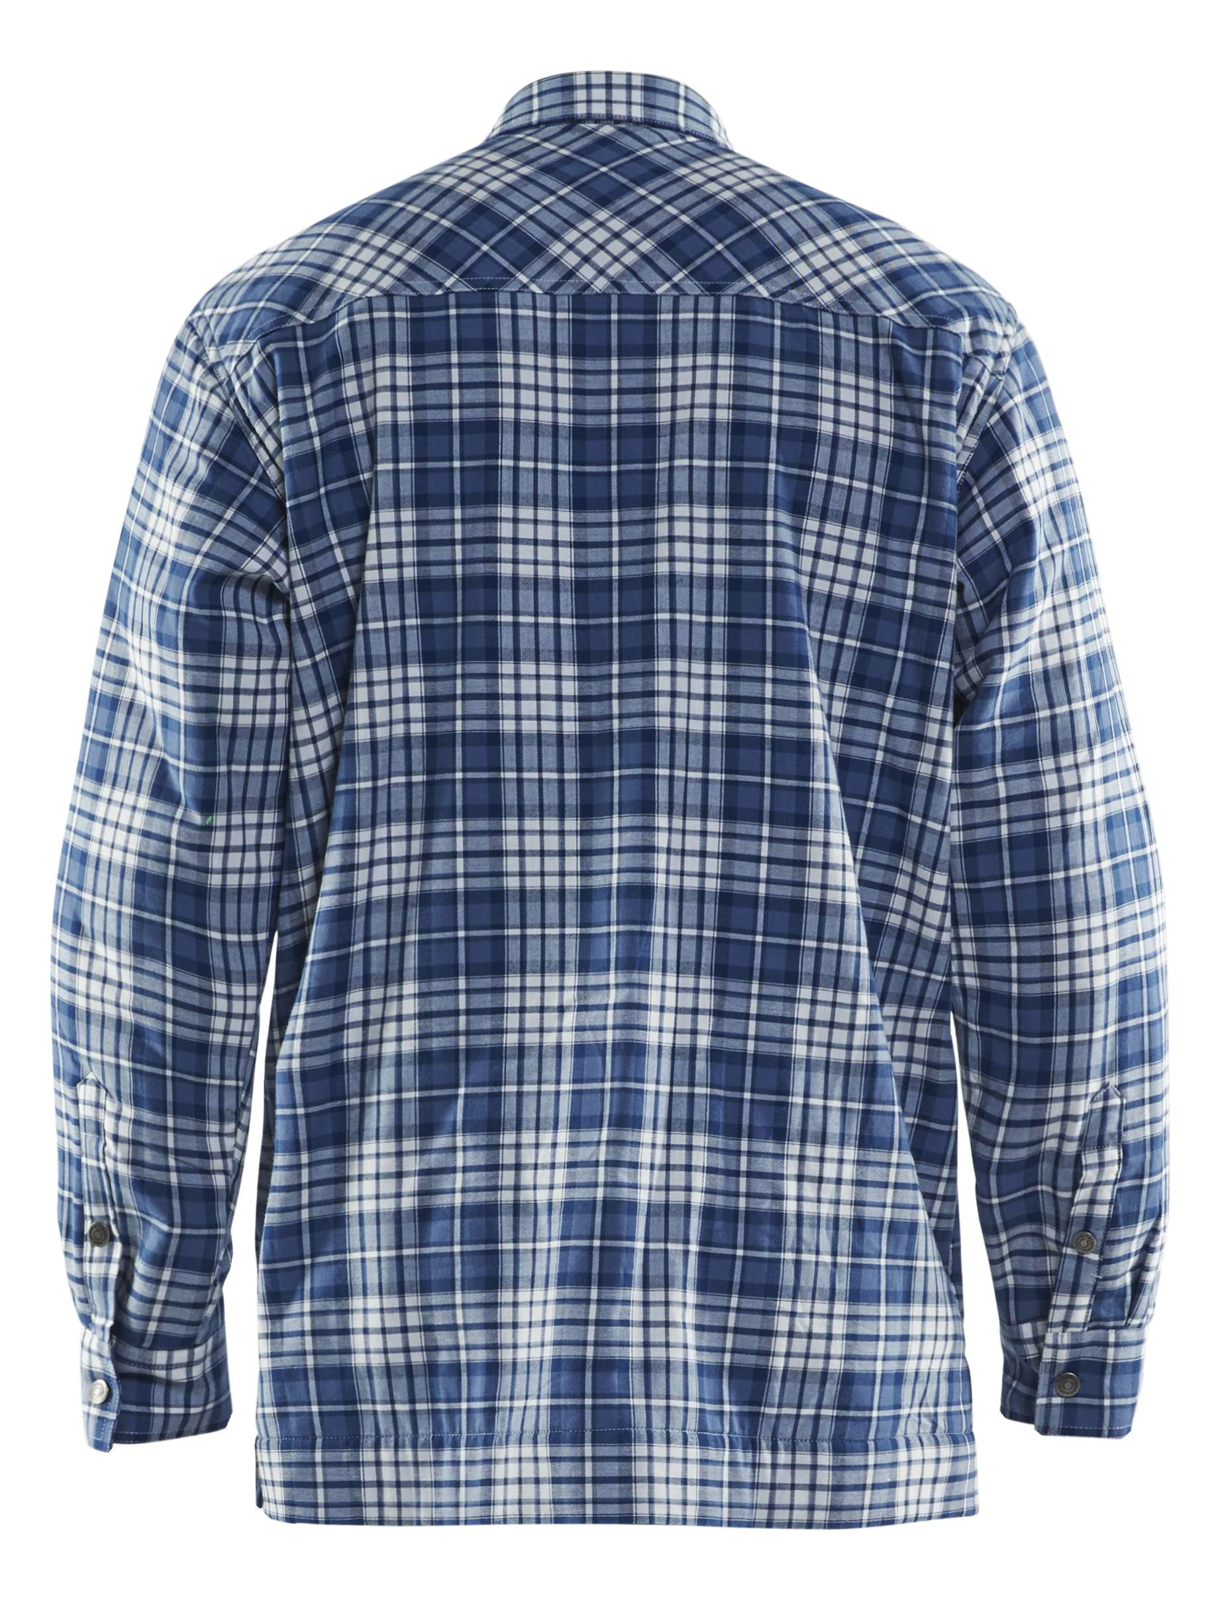 Blaklader Overhemden 32901130 korenblauw-marineblauw(8589)